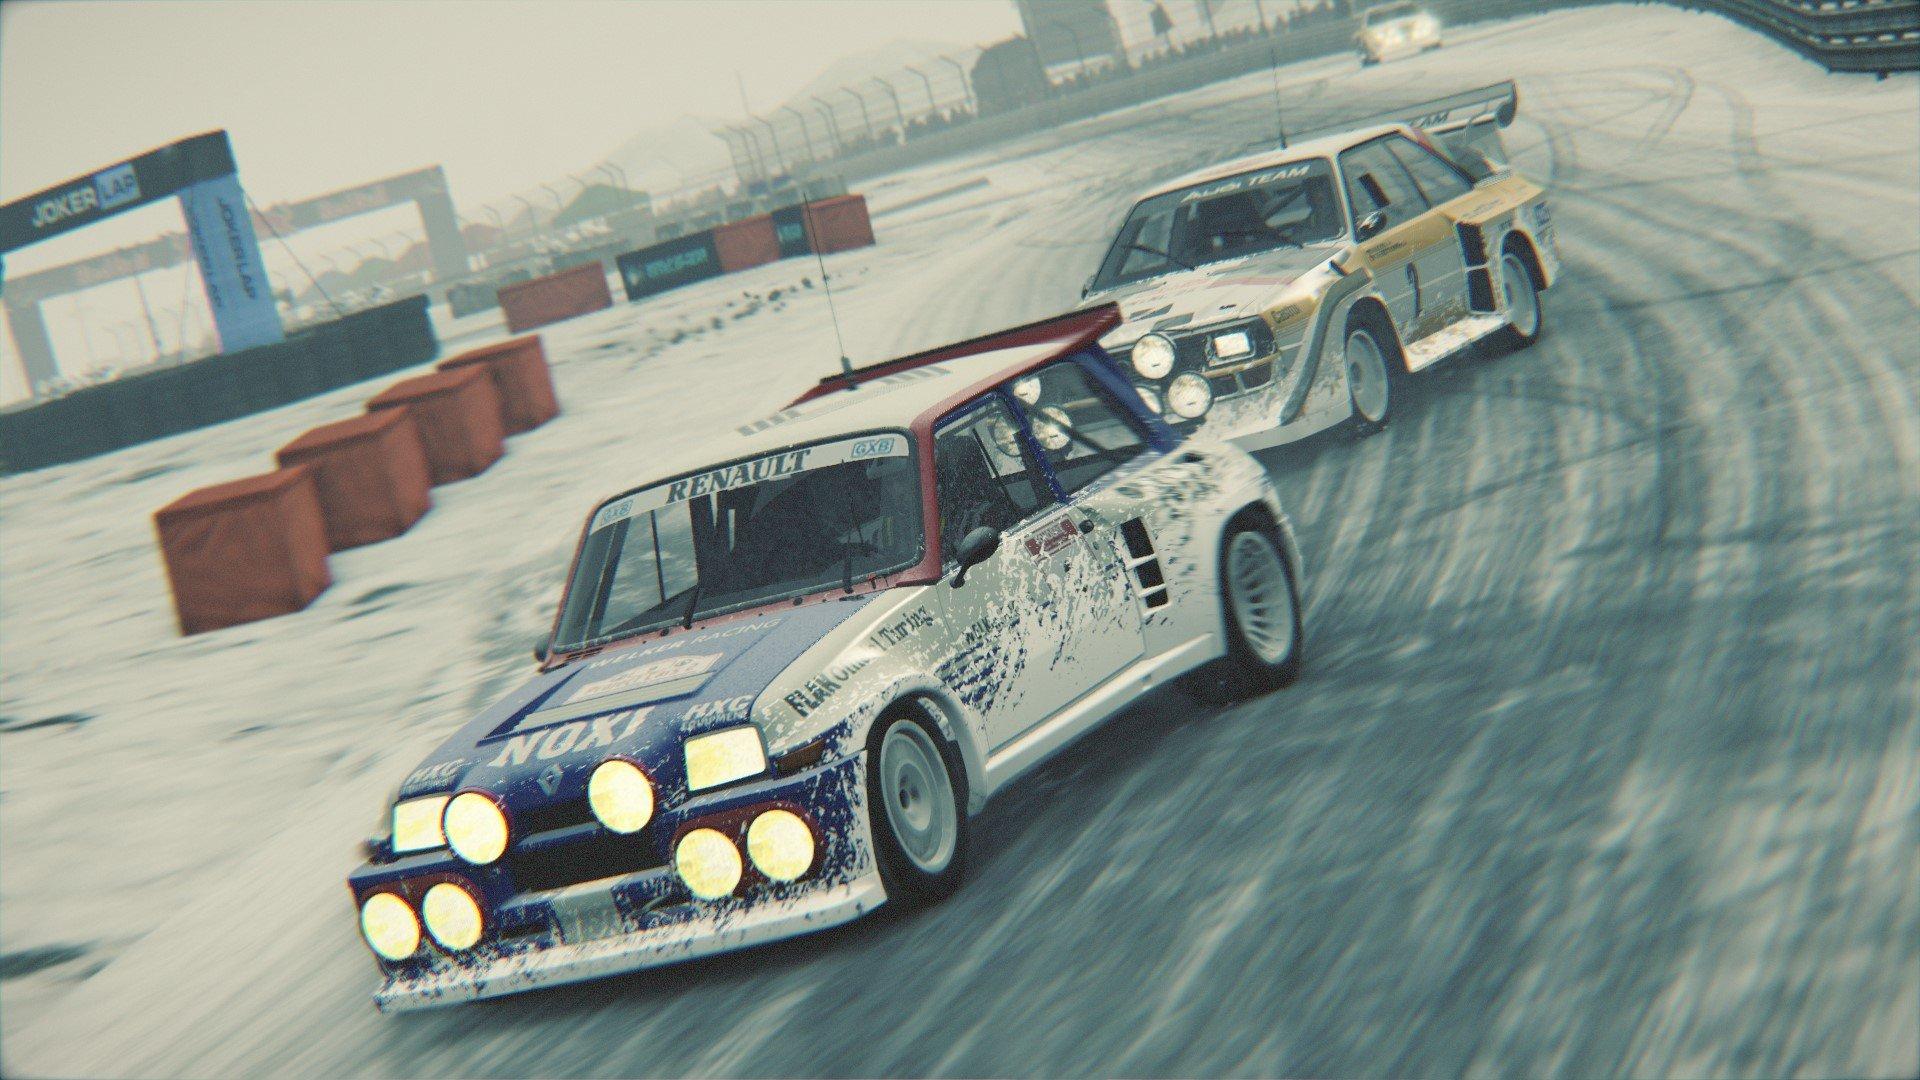 Project-CARS-2-Renault-5-Turbo-Derin-Almas.jpg